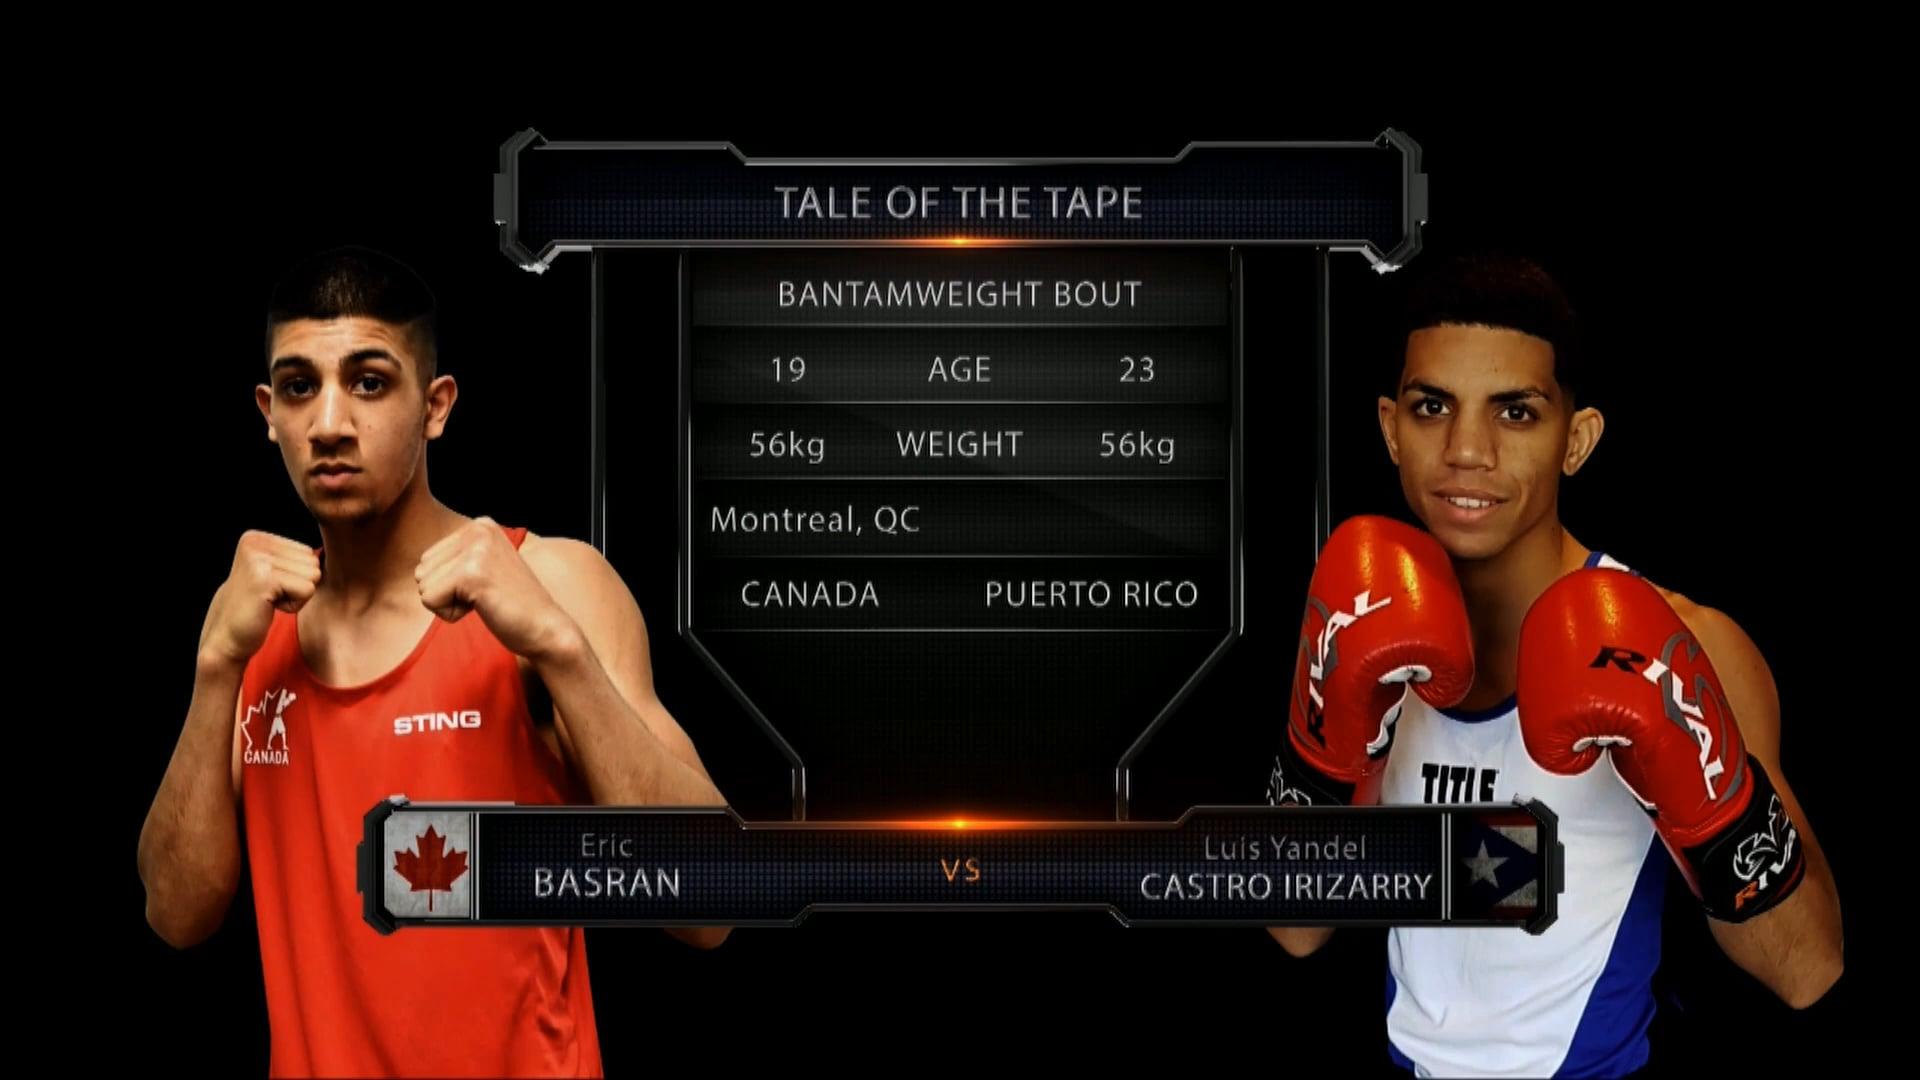 Basran (CAN) vs Castro Irizarry (PR)